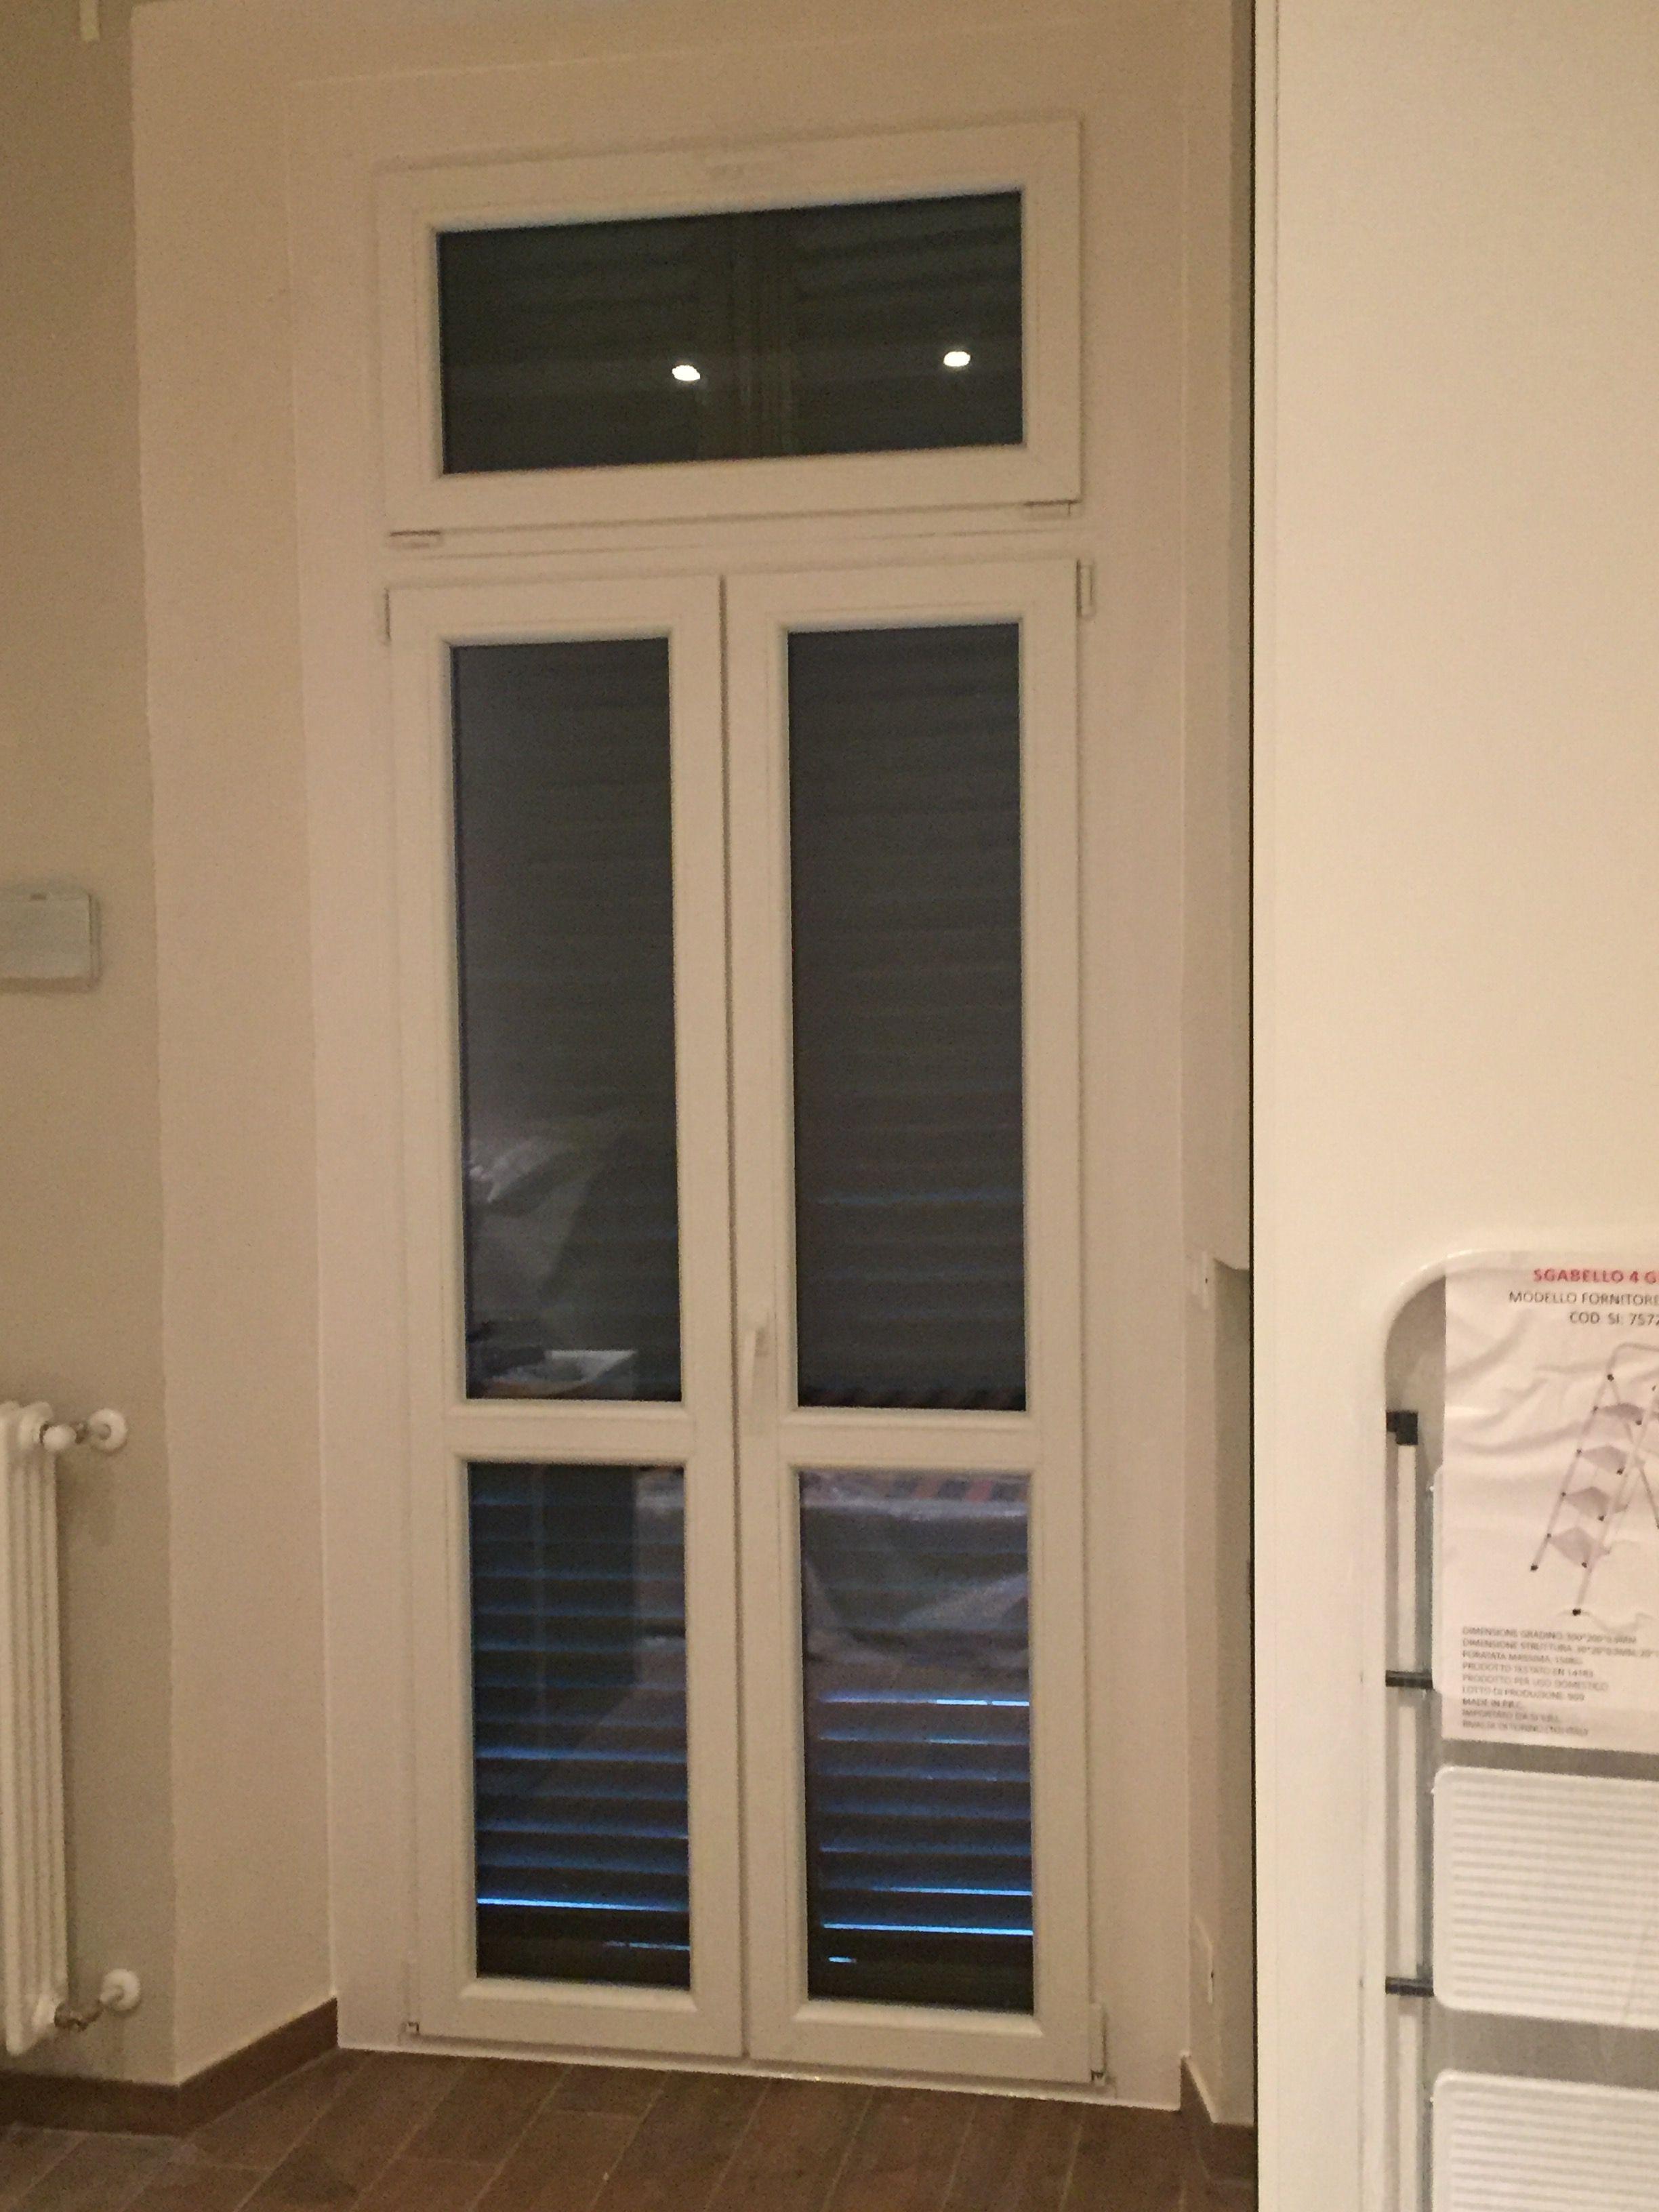 Porta Due Ante Con Sopra Luce Apribile Vasistas In Pvc Bianco Vasistas Finestra Luci